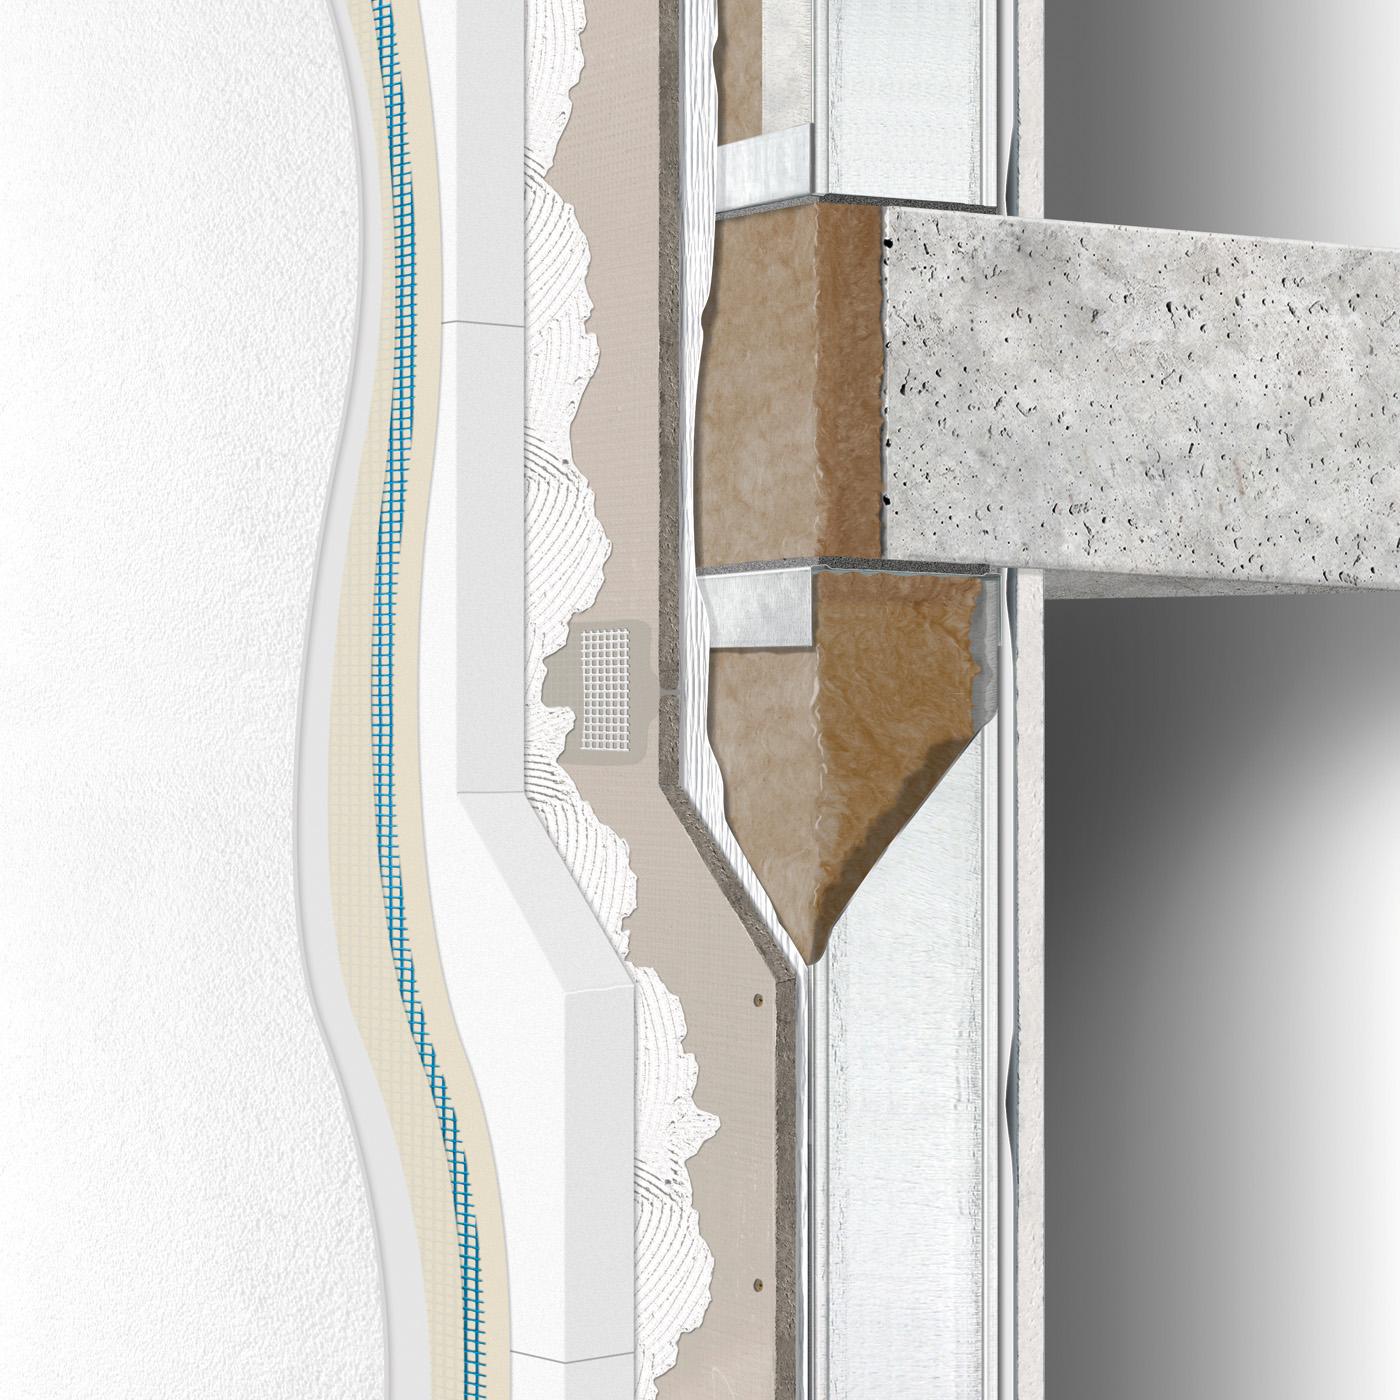 Exterior wall construction between floors with ETICS single stud